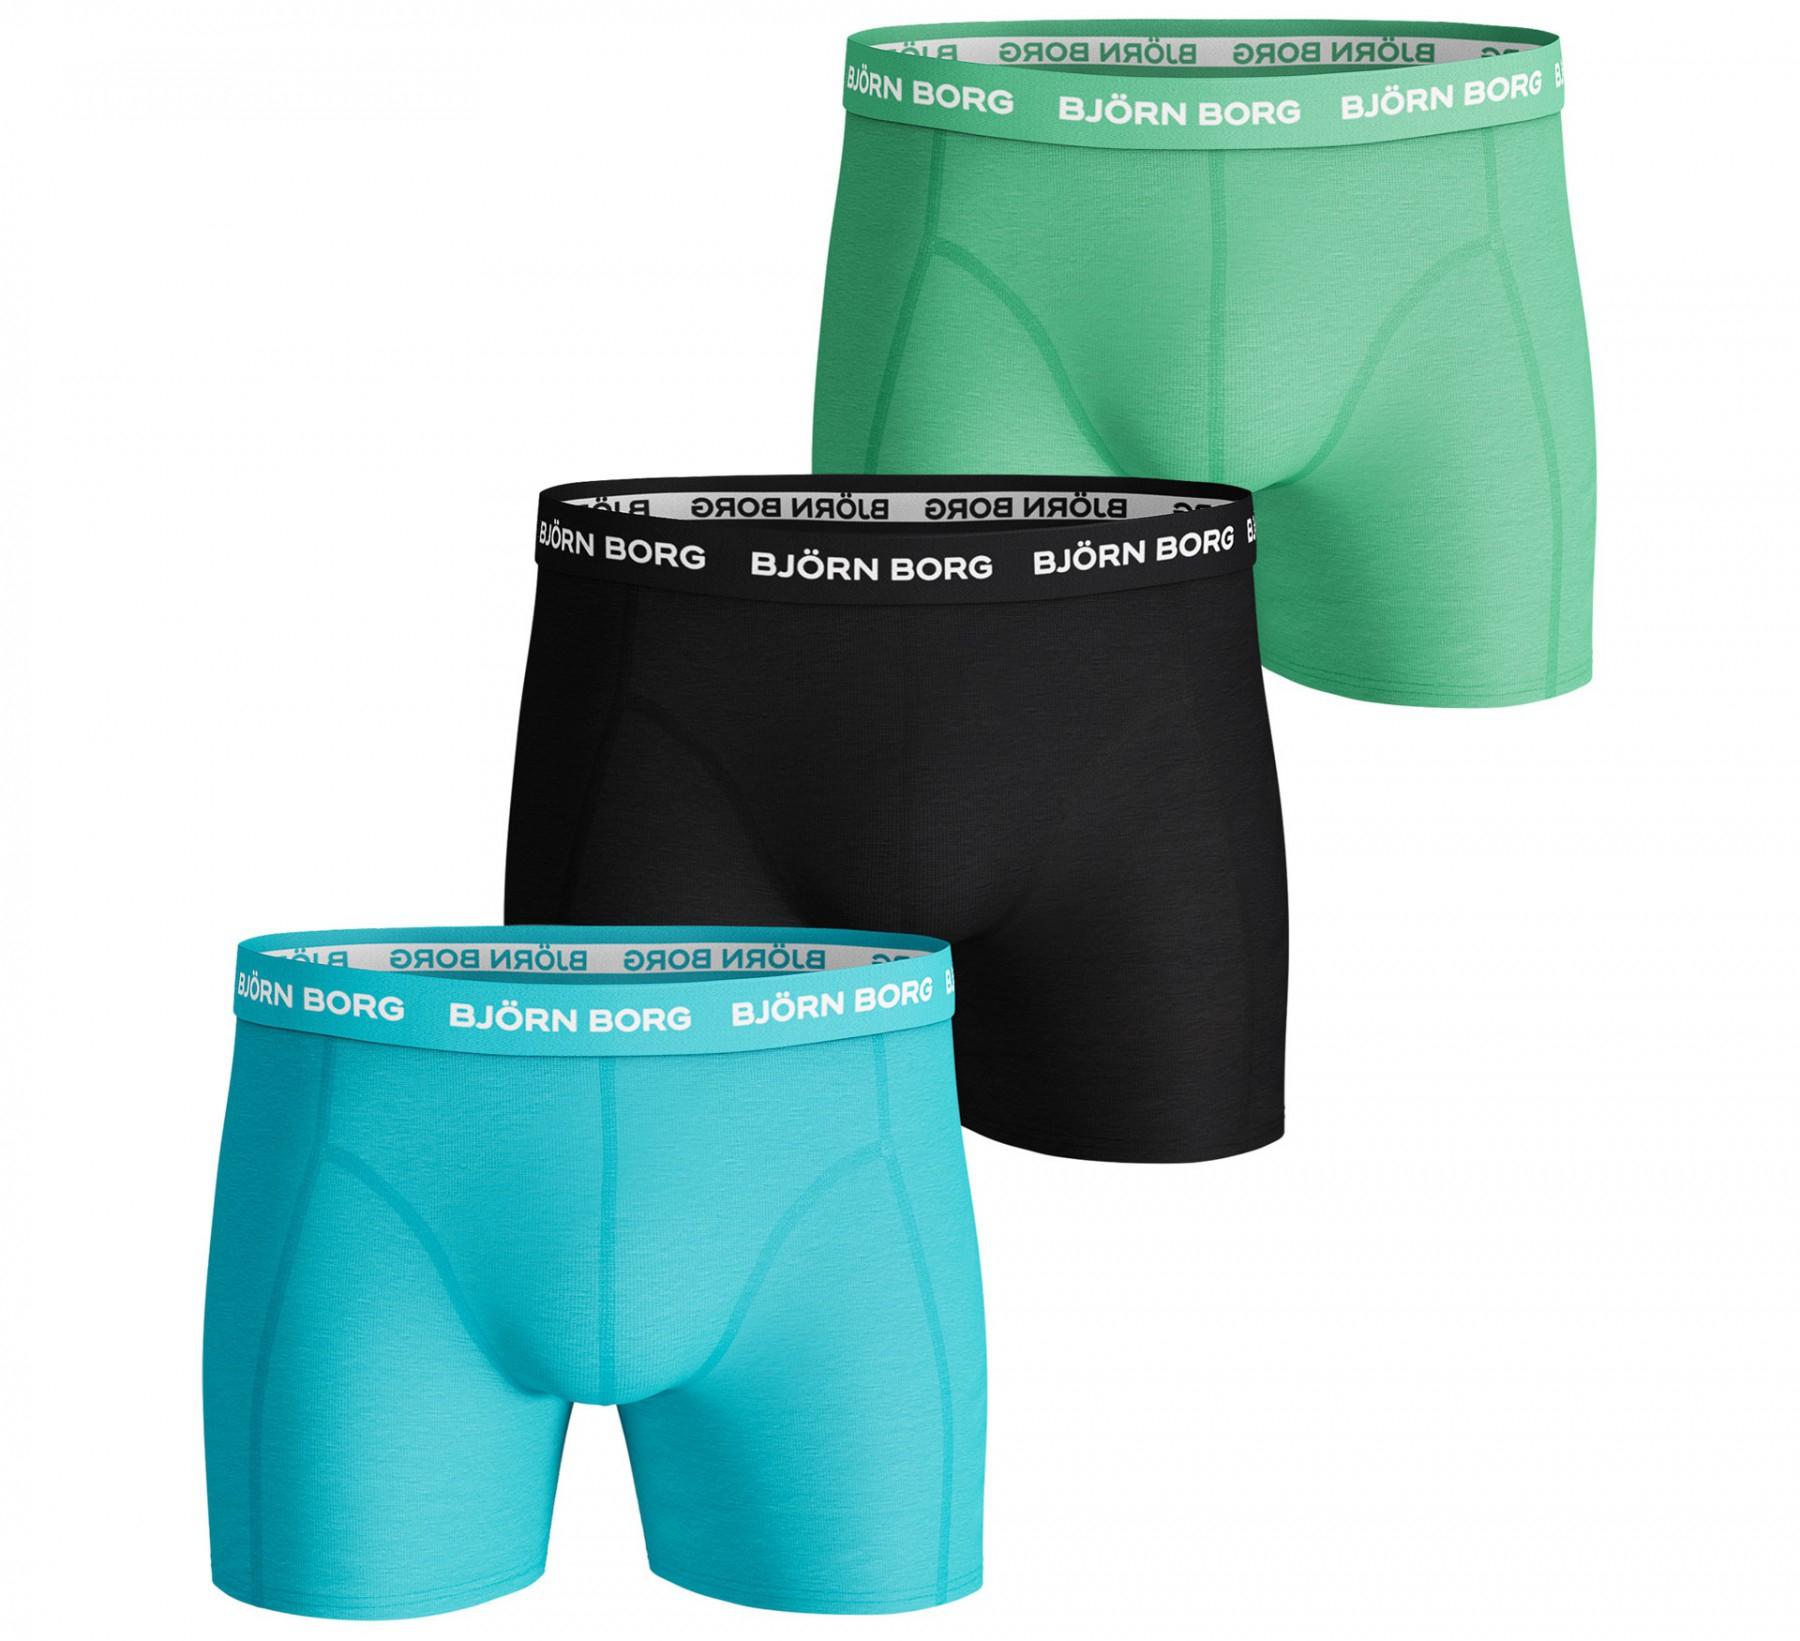 Björn Borg Seasonal Solids boxershort 3-pack heren blauw/groen